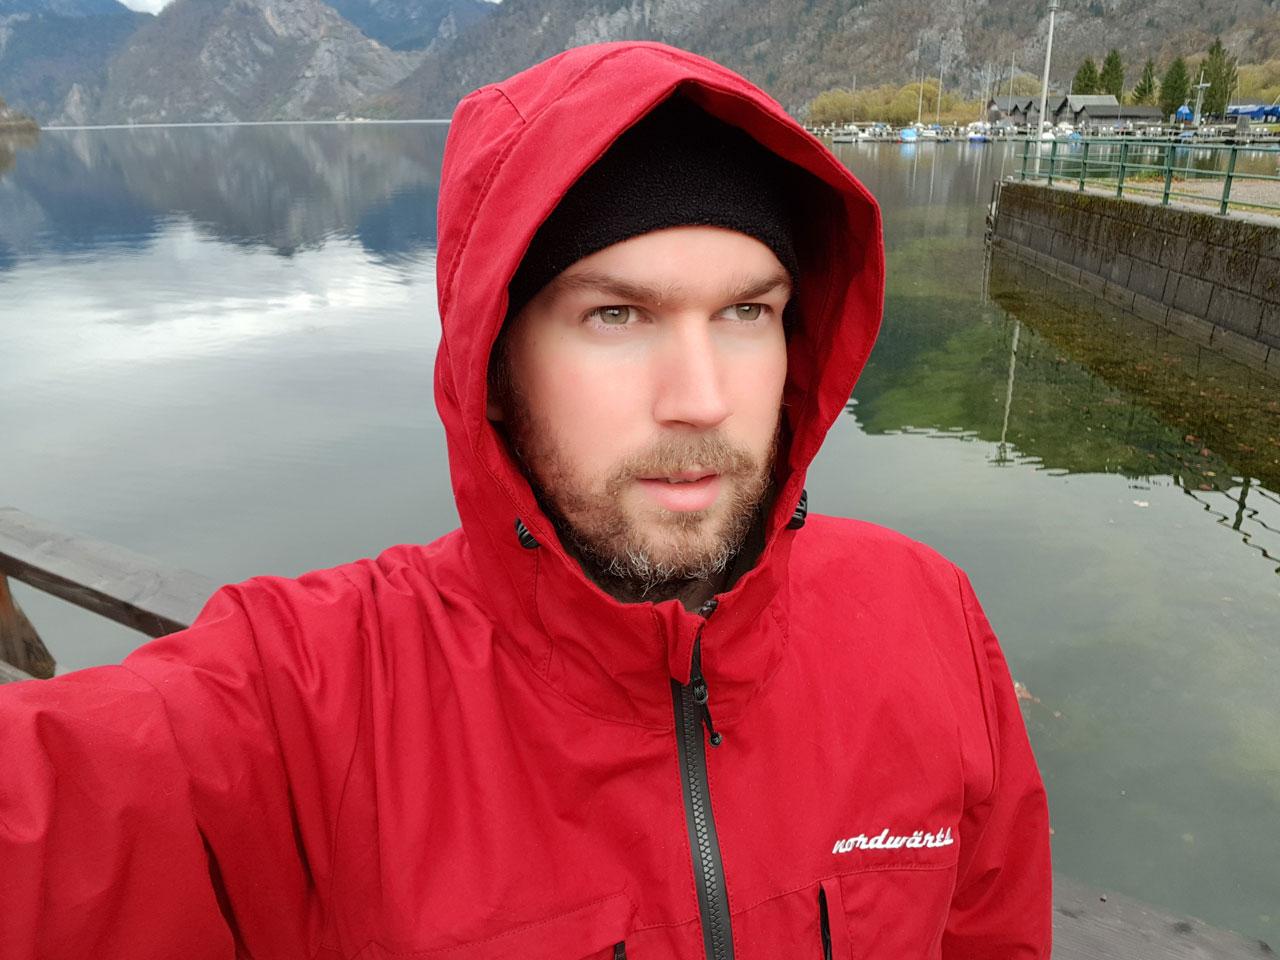 Nordwärts Lenne EtaProof Jacke im Test | Review auf Outdoor